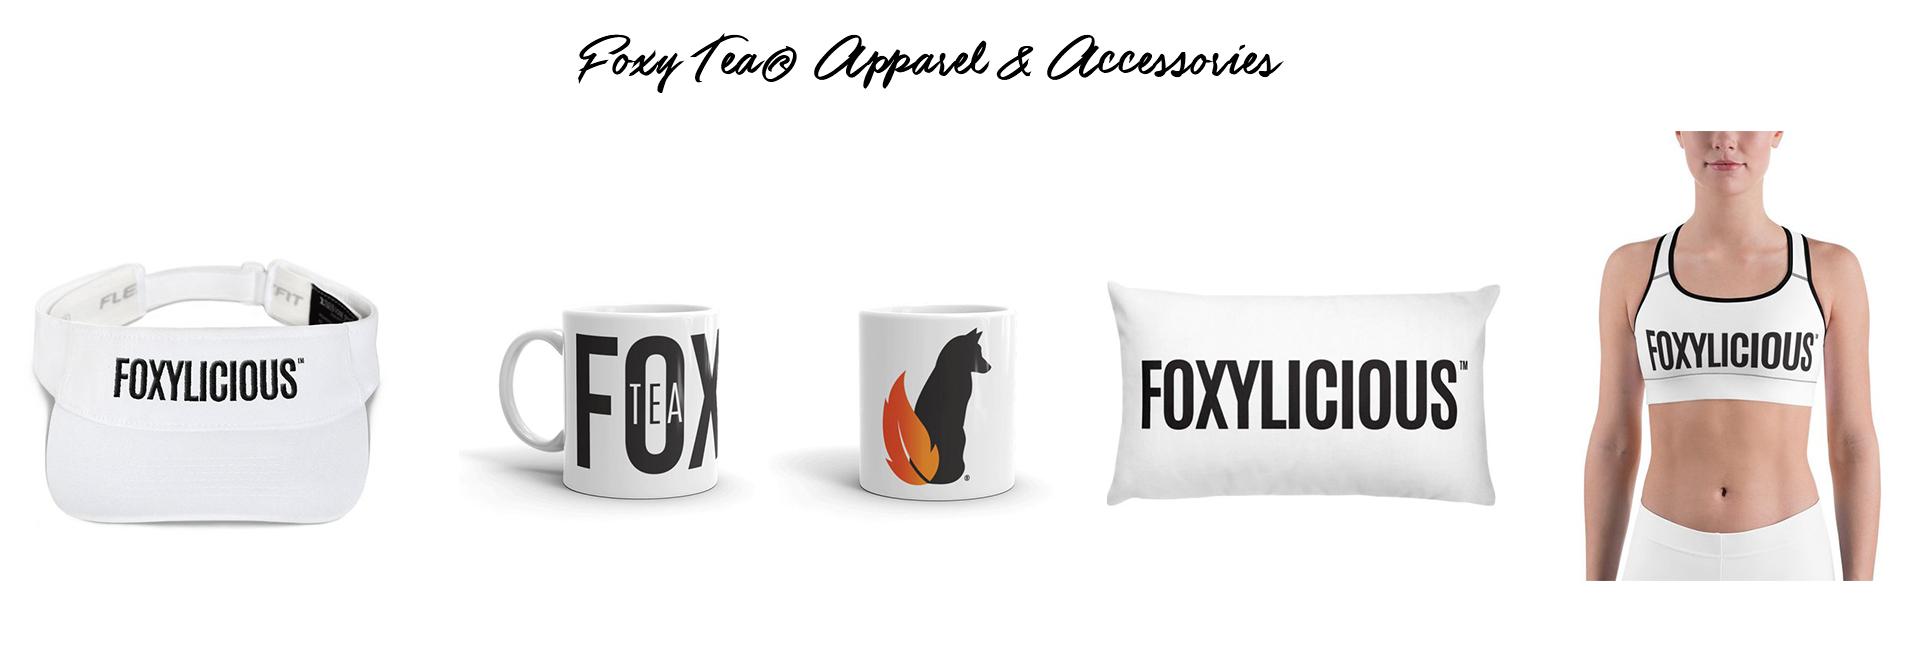 accessories1